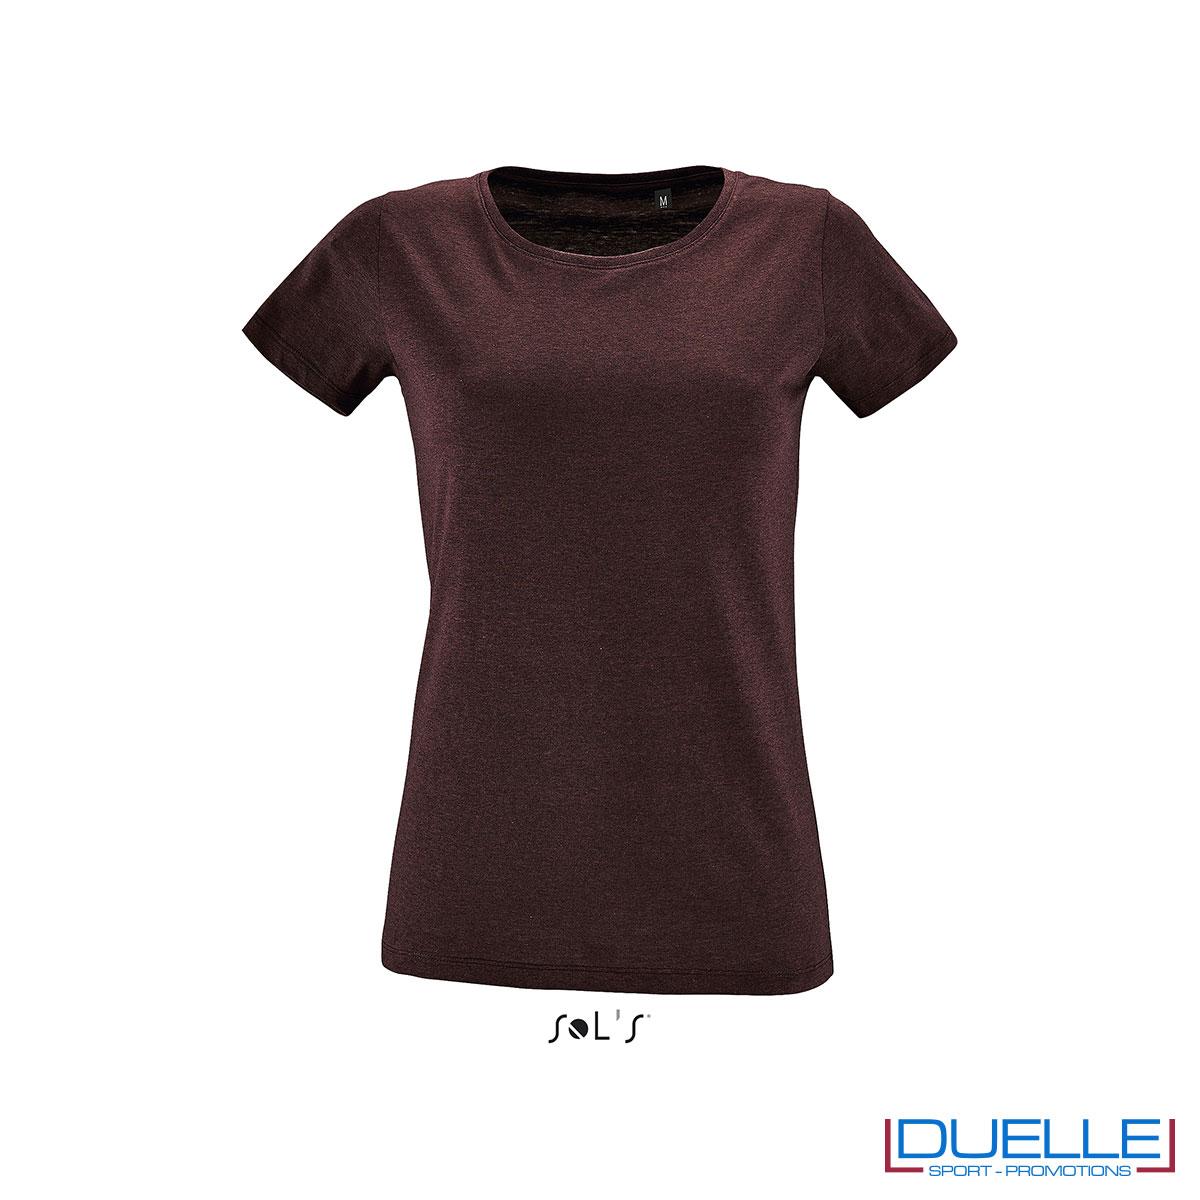 maglia rosso borgogna melange fit donna